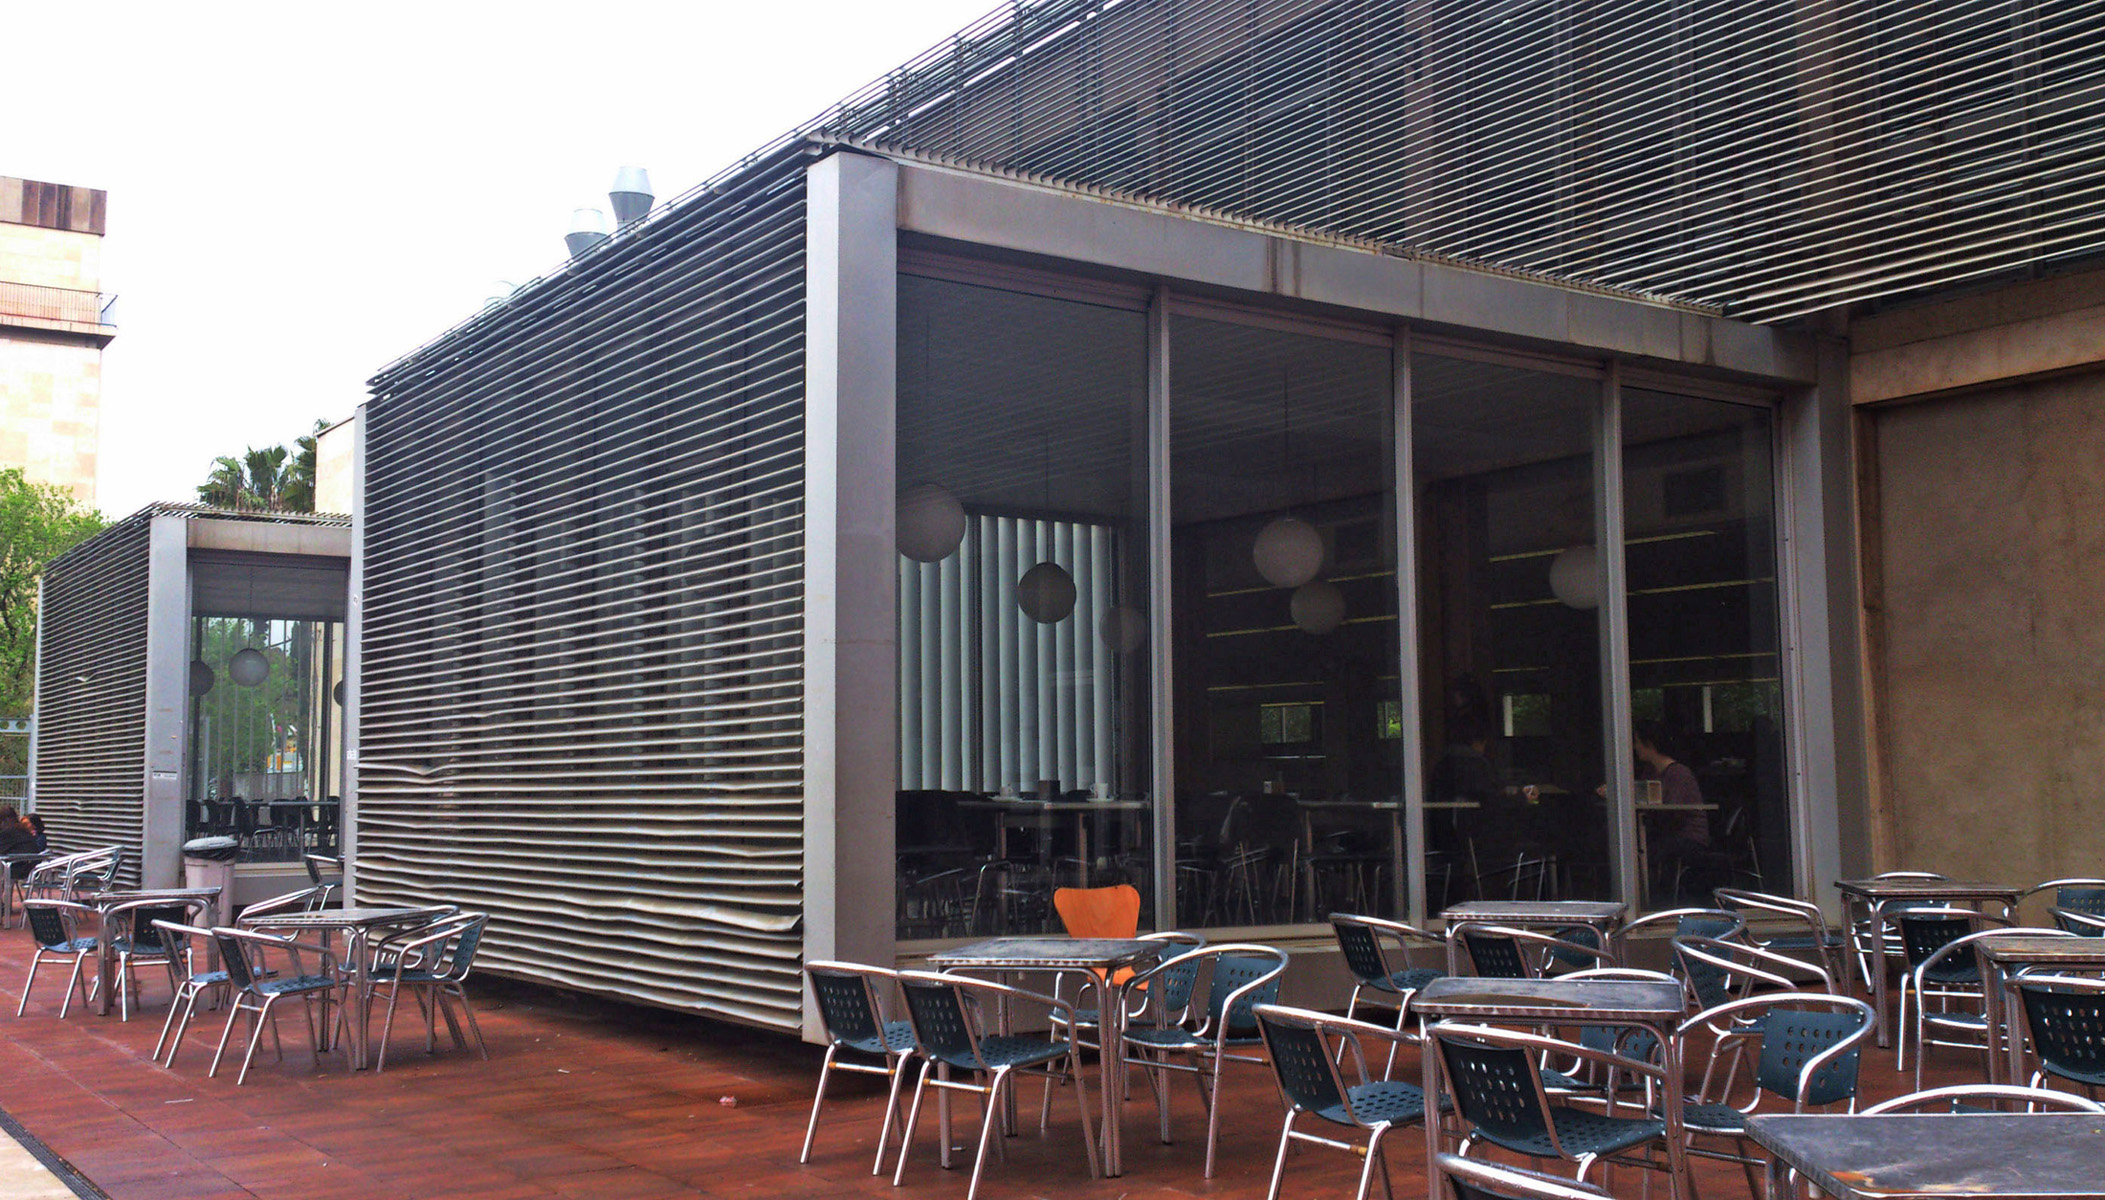 Terrace sunroom on architecture school in barcelona 358 for School terrace